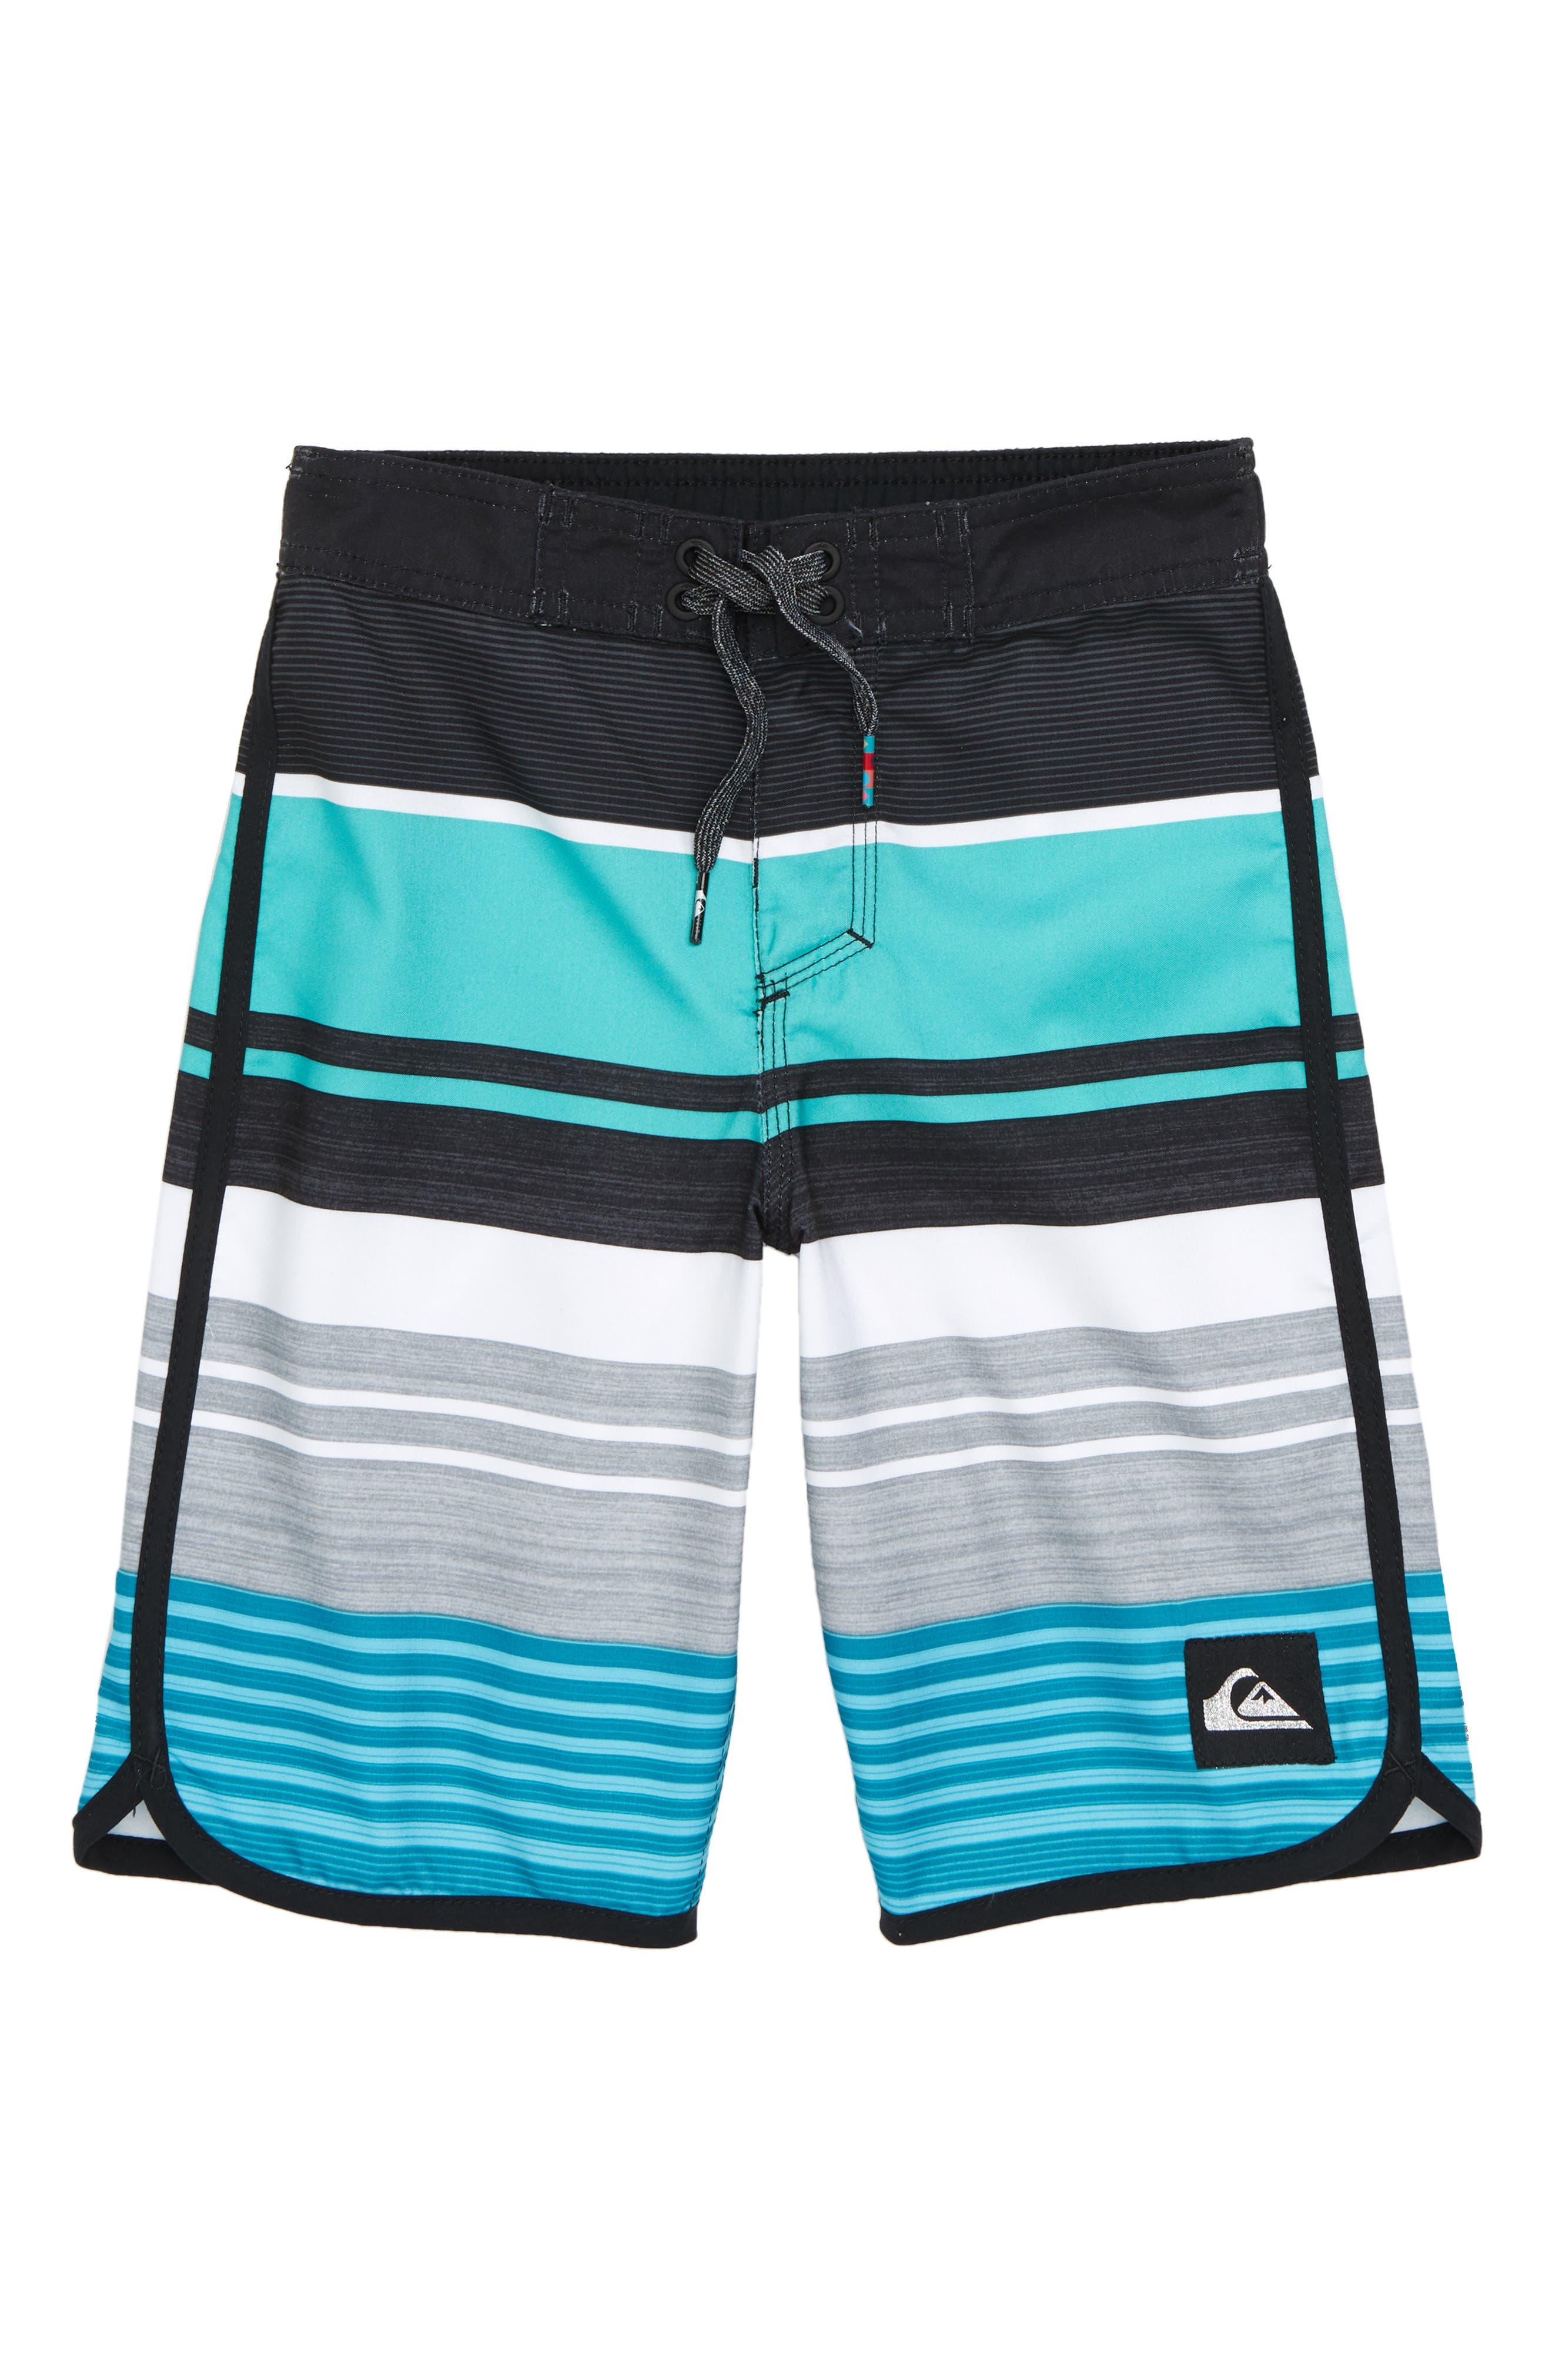 Eye Scallop Board Shorts,                             Main thumbnail 1, color,                             TYPHOON